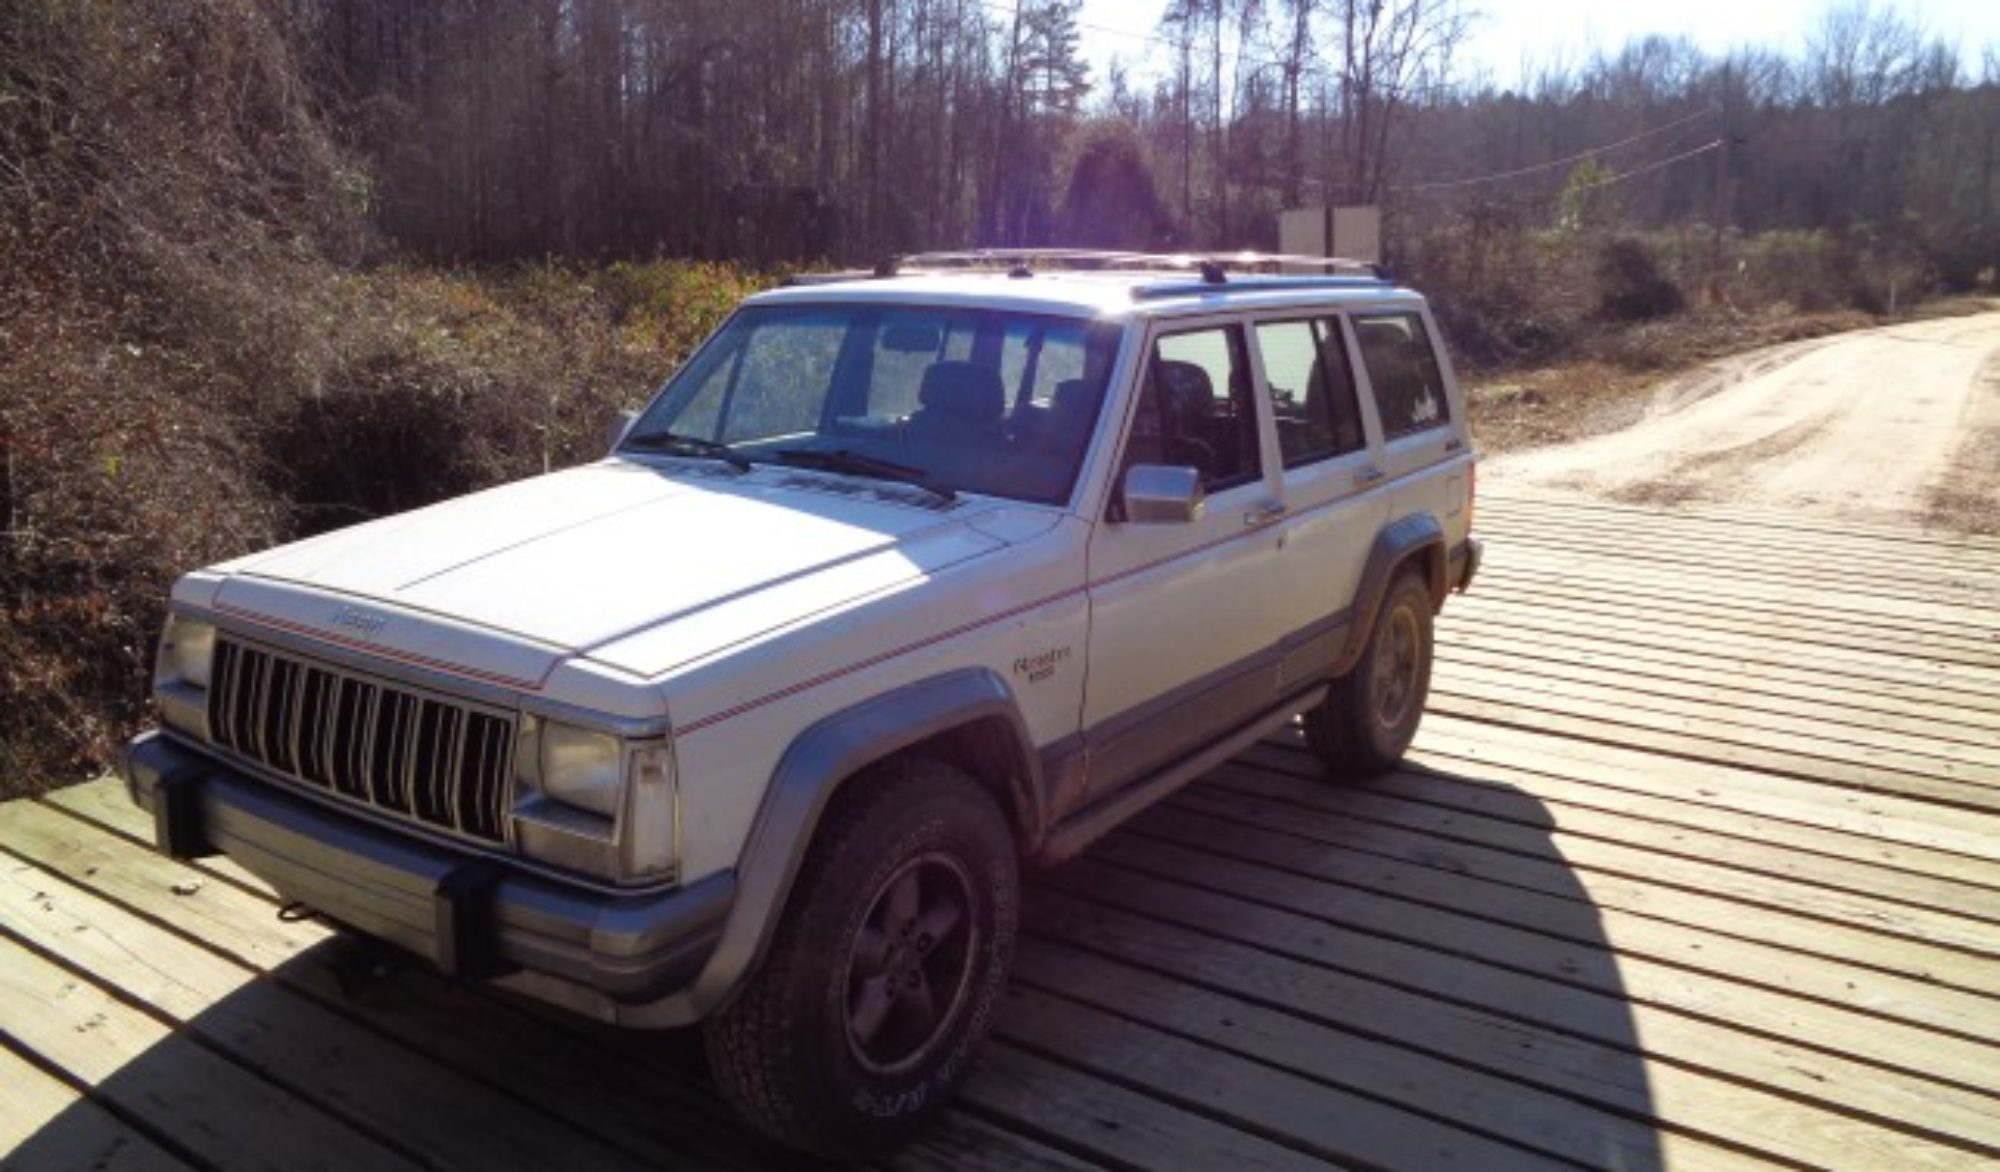 The Jeep Guru